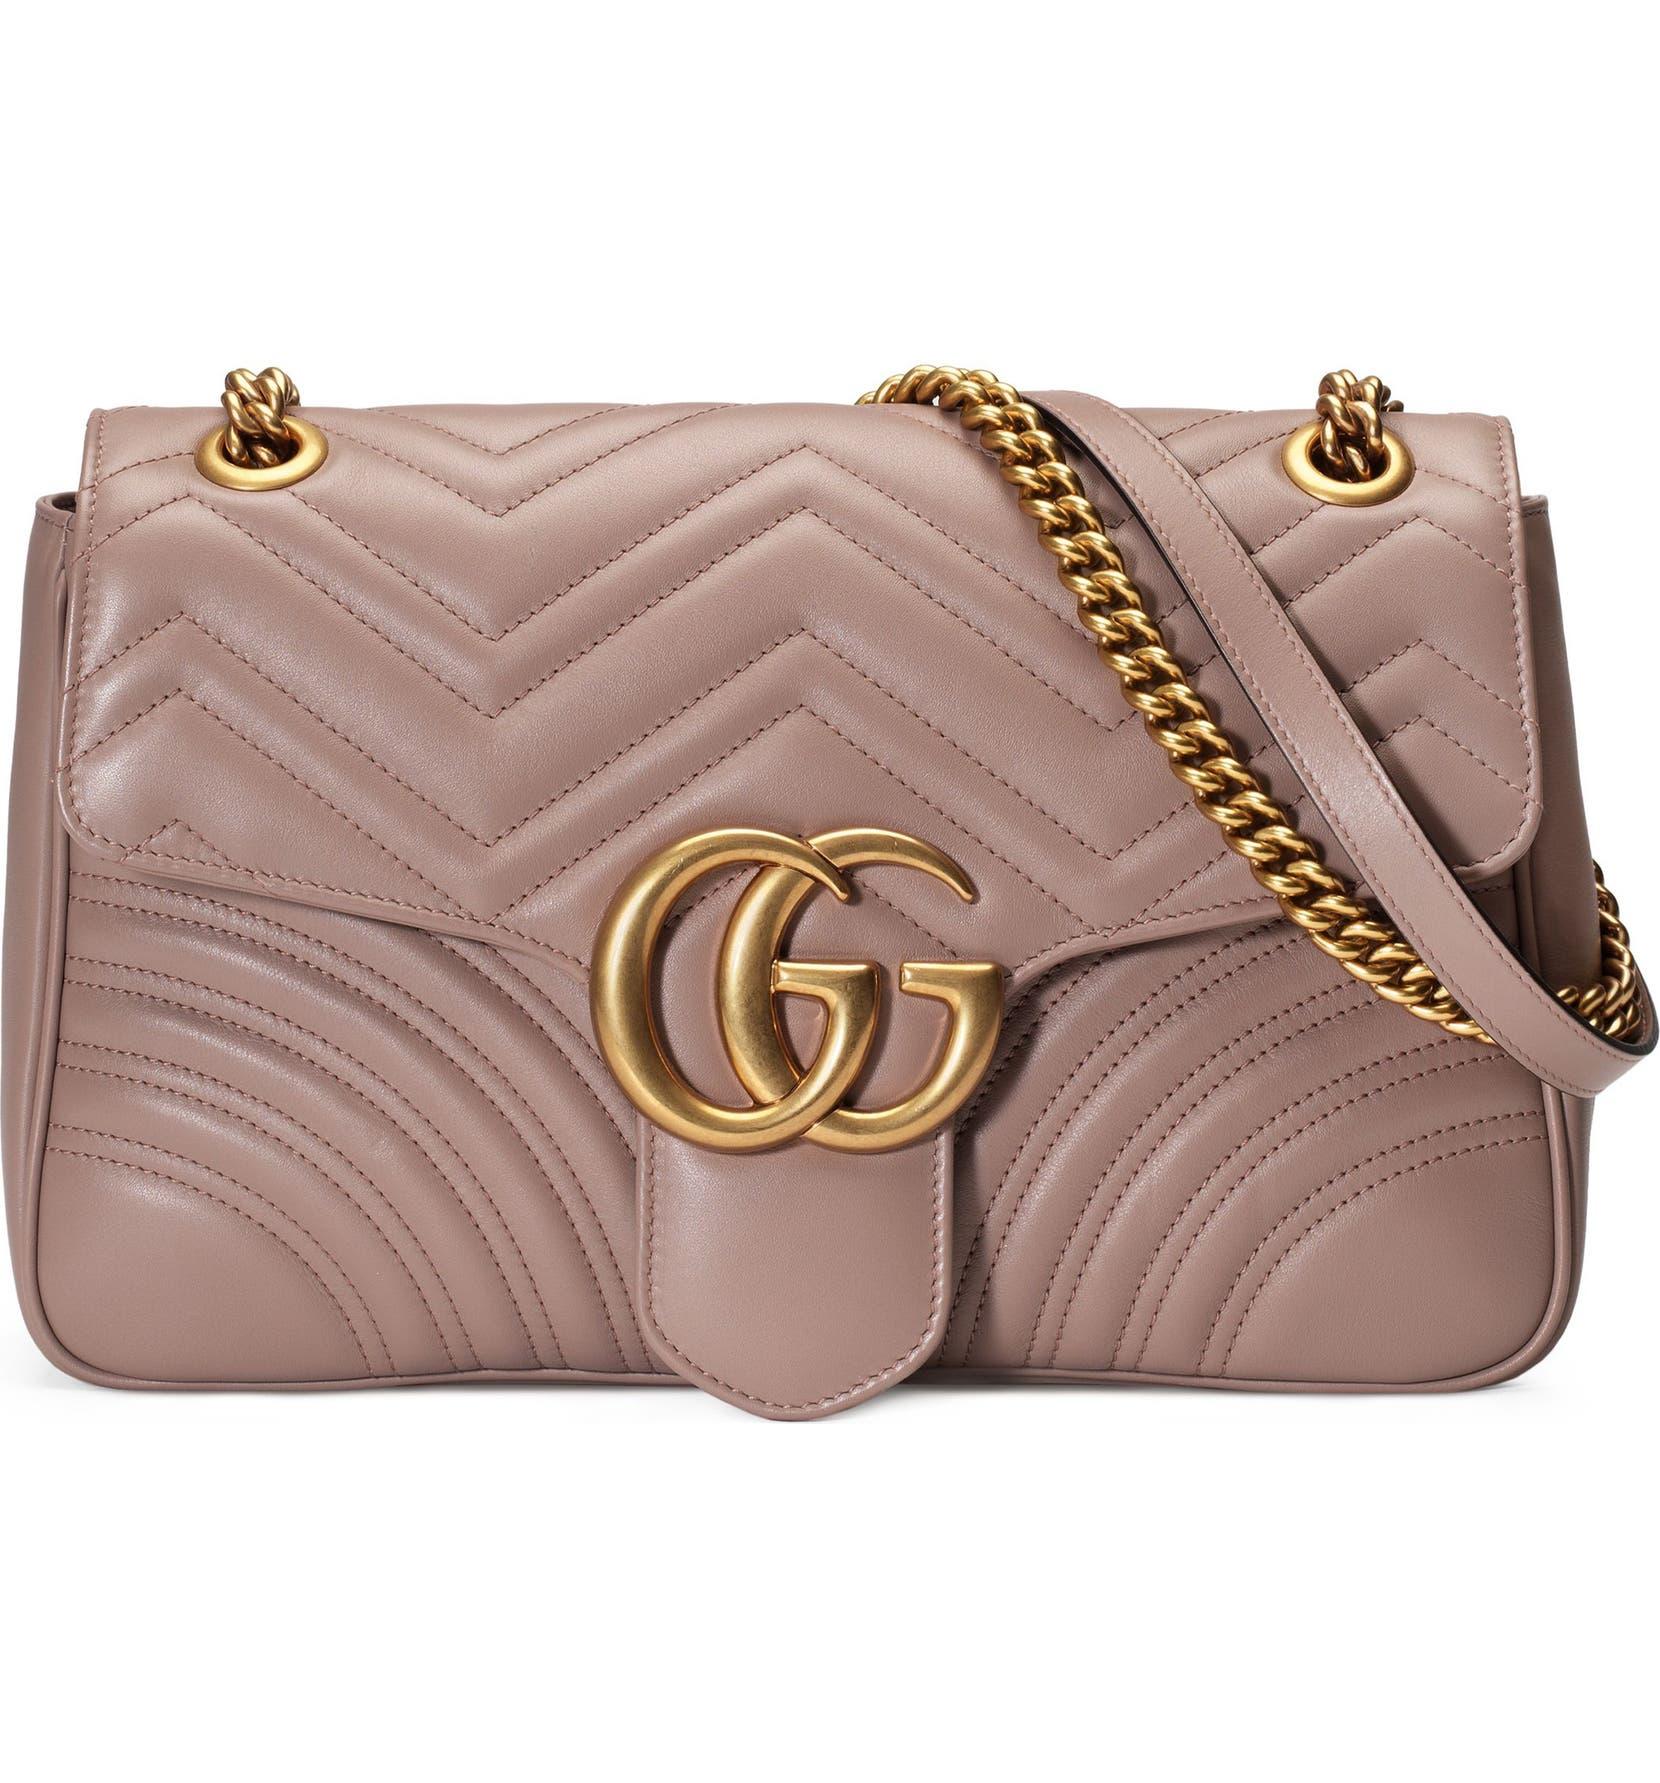 Gucci Medium GG Marmont 2.0 Matelassé Leather Shoulder Bag  aacf271cab6fb